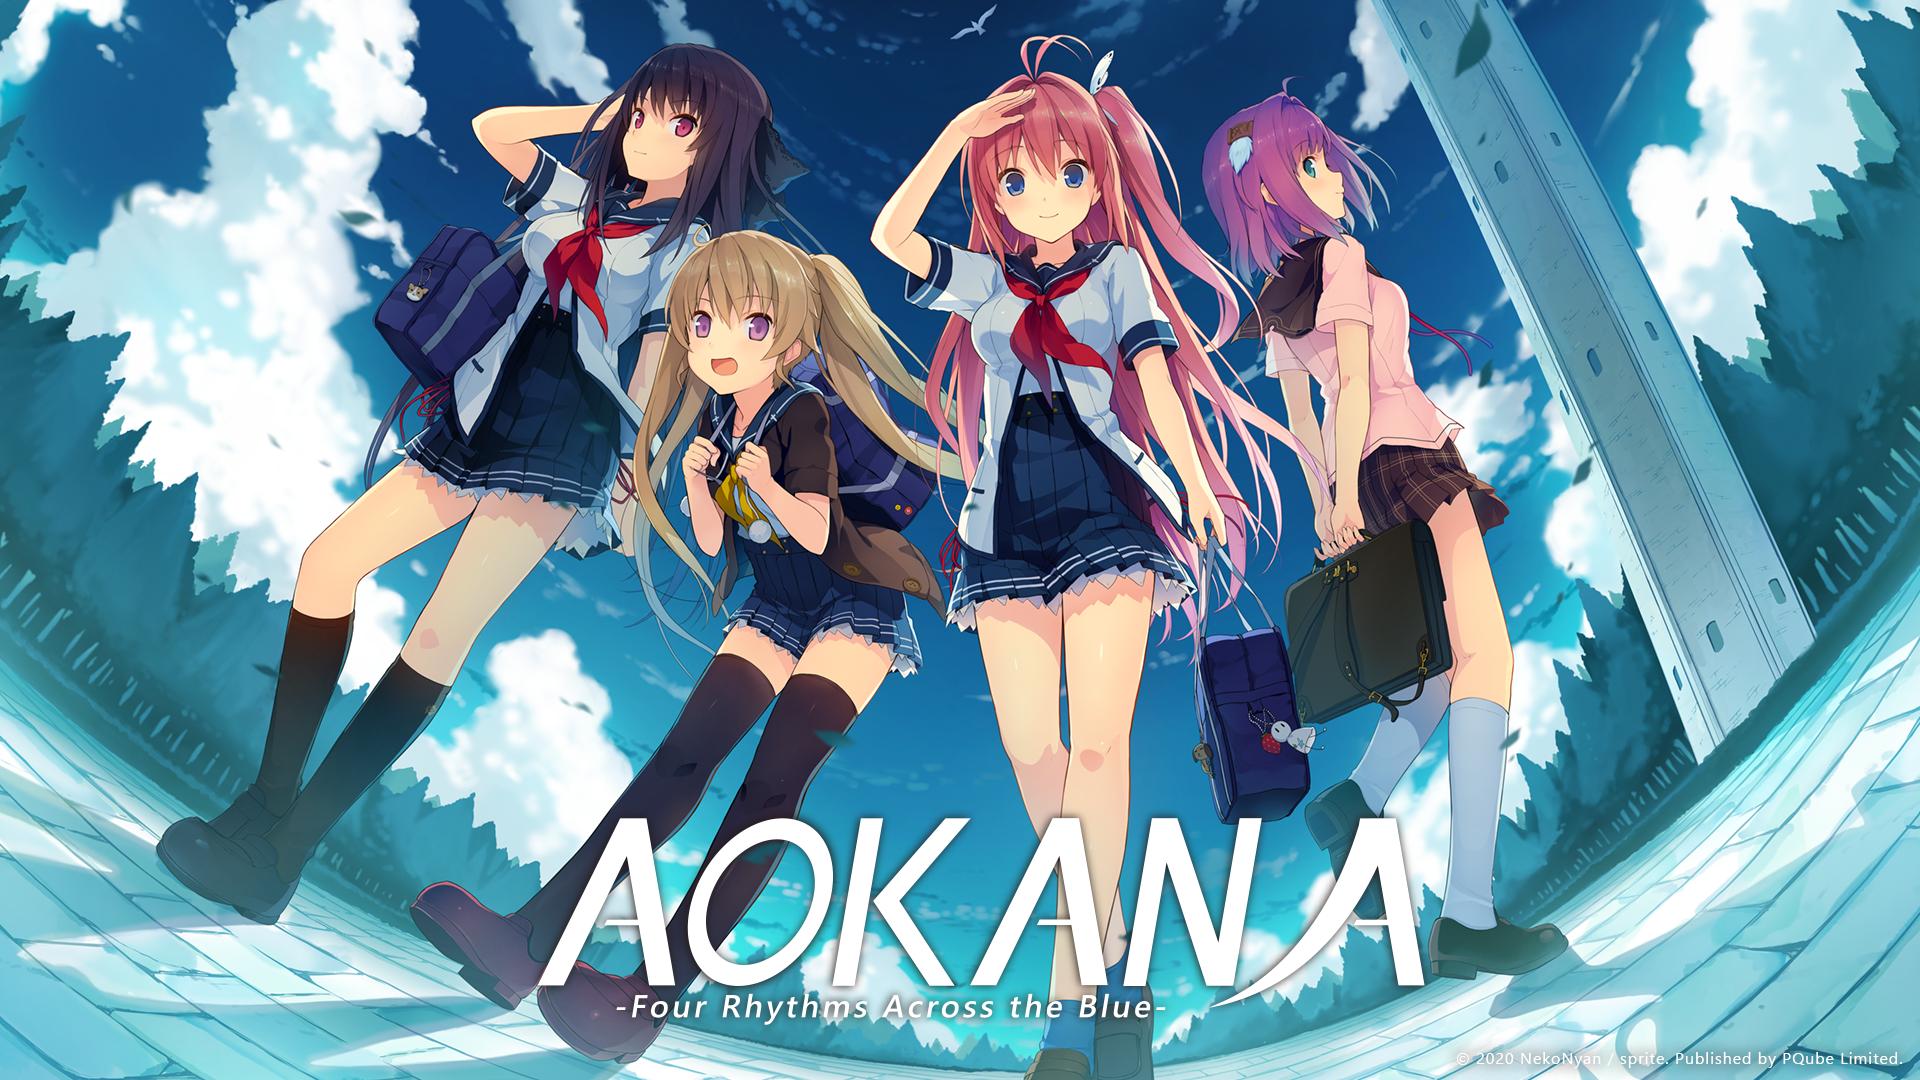 Aokana